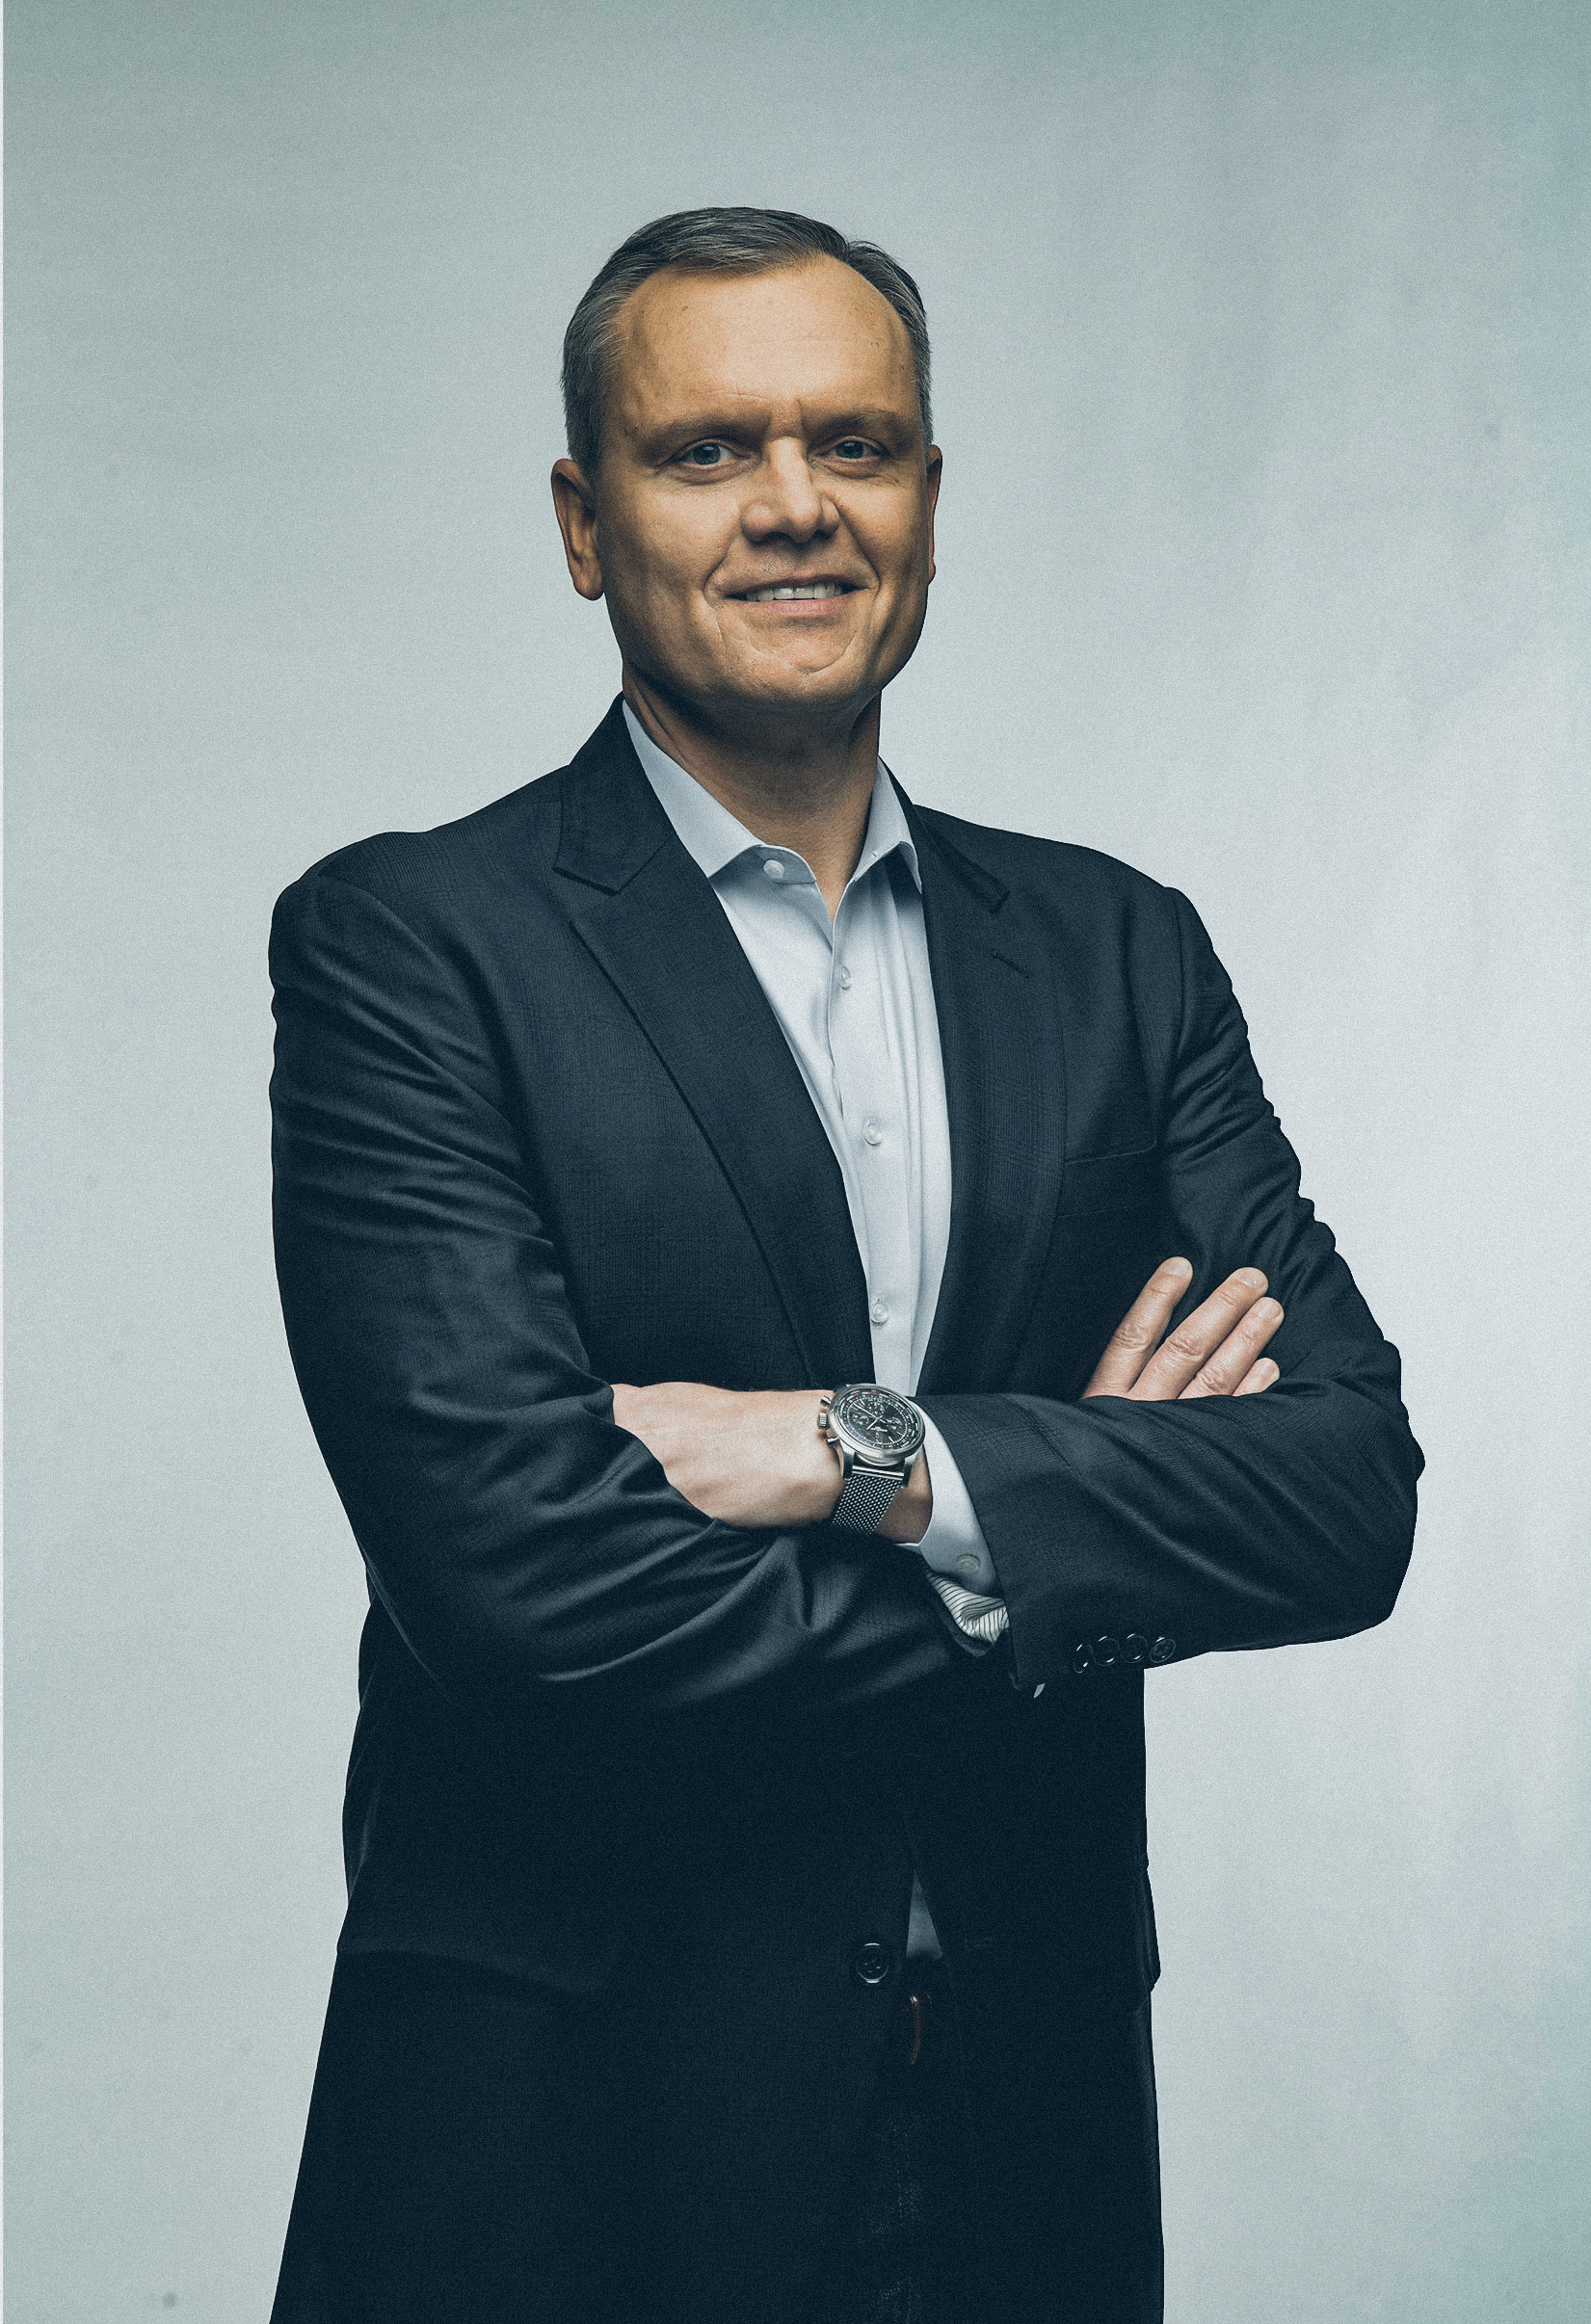 Darius Adamczyk